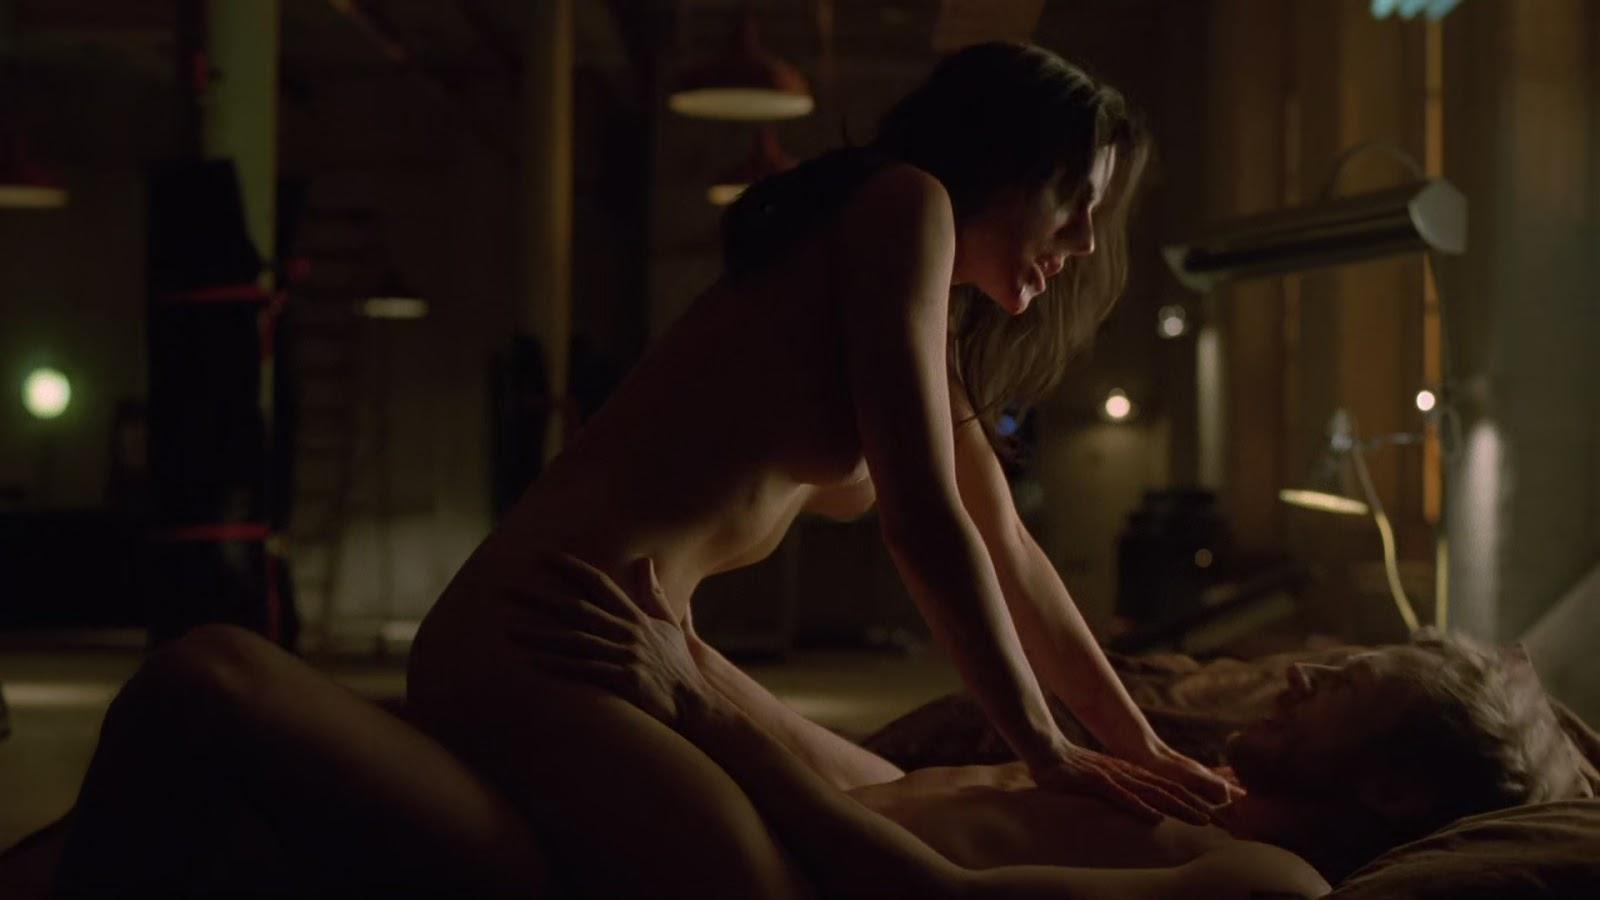 Anna silk and erin karpluk nude lesbo scene in being erica